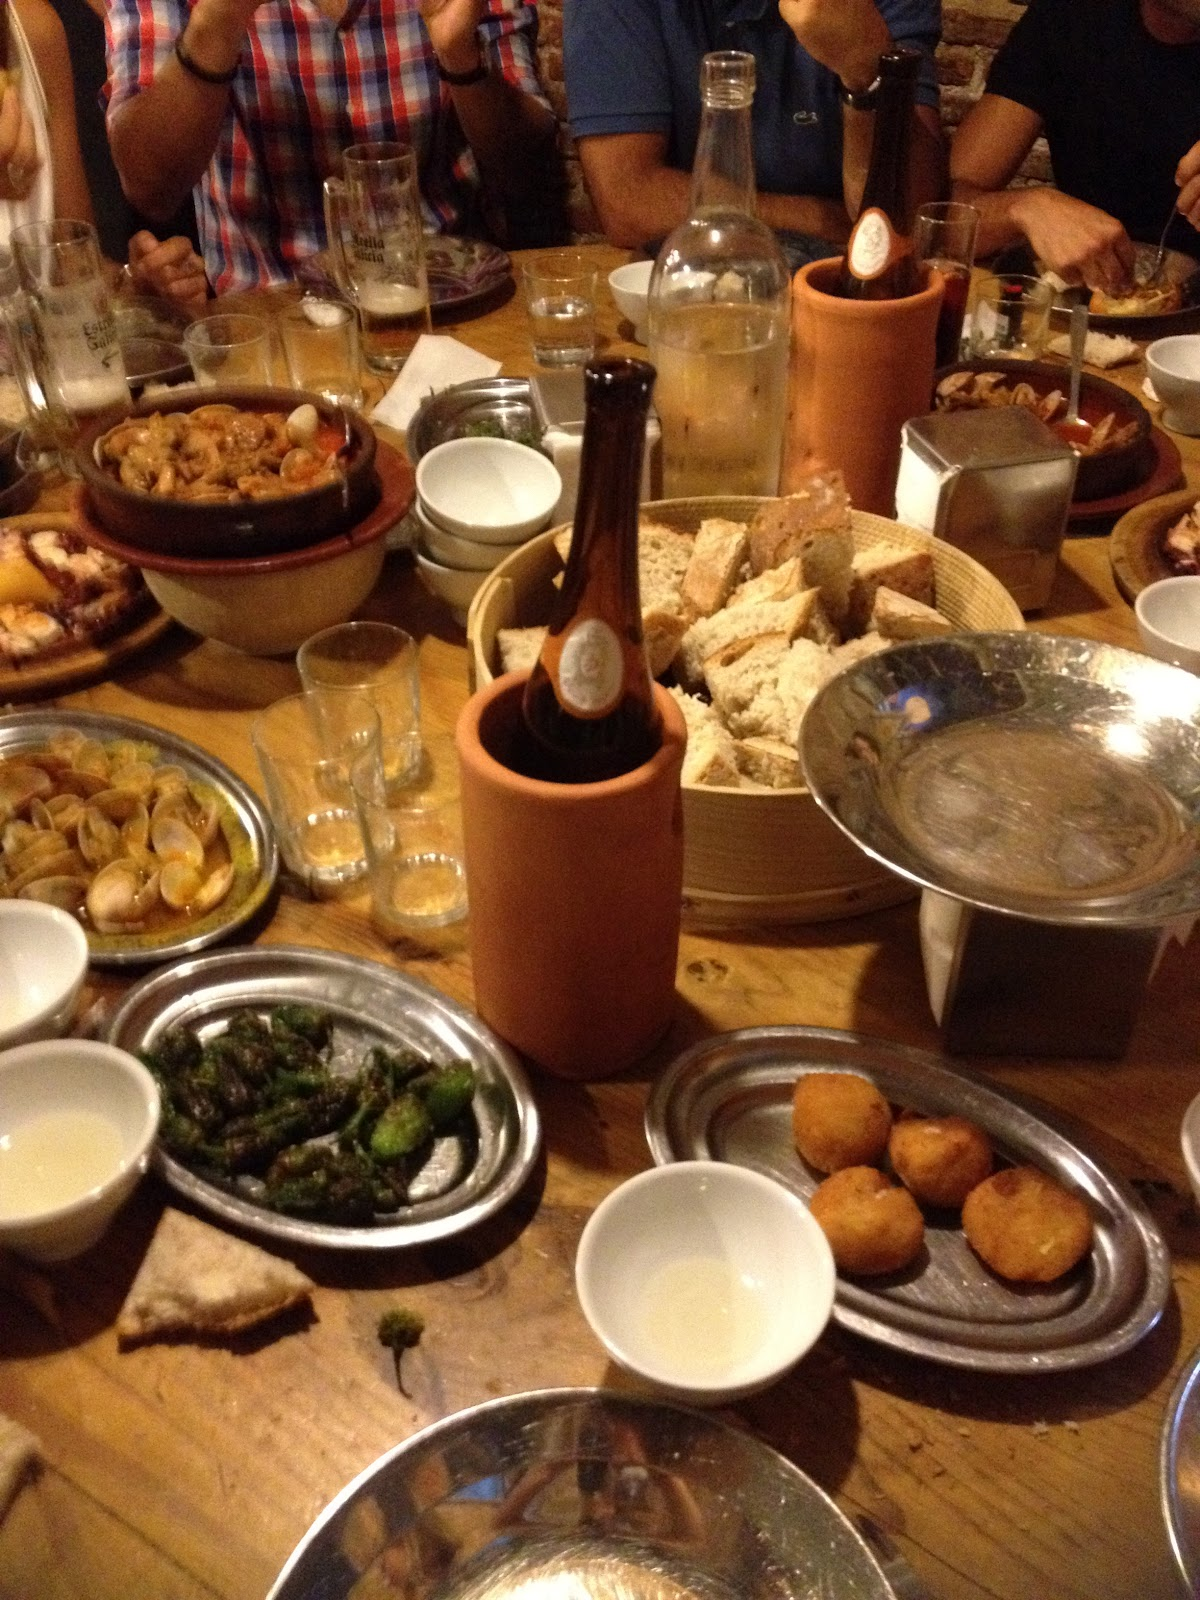 Menu de madrid sortir entre amis et manger galicien for Que manger entre amis